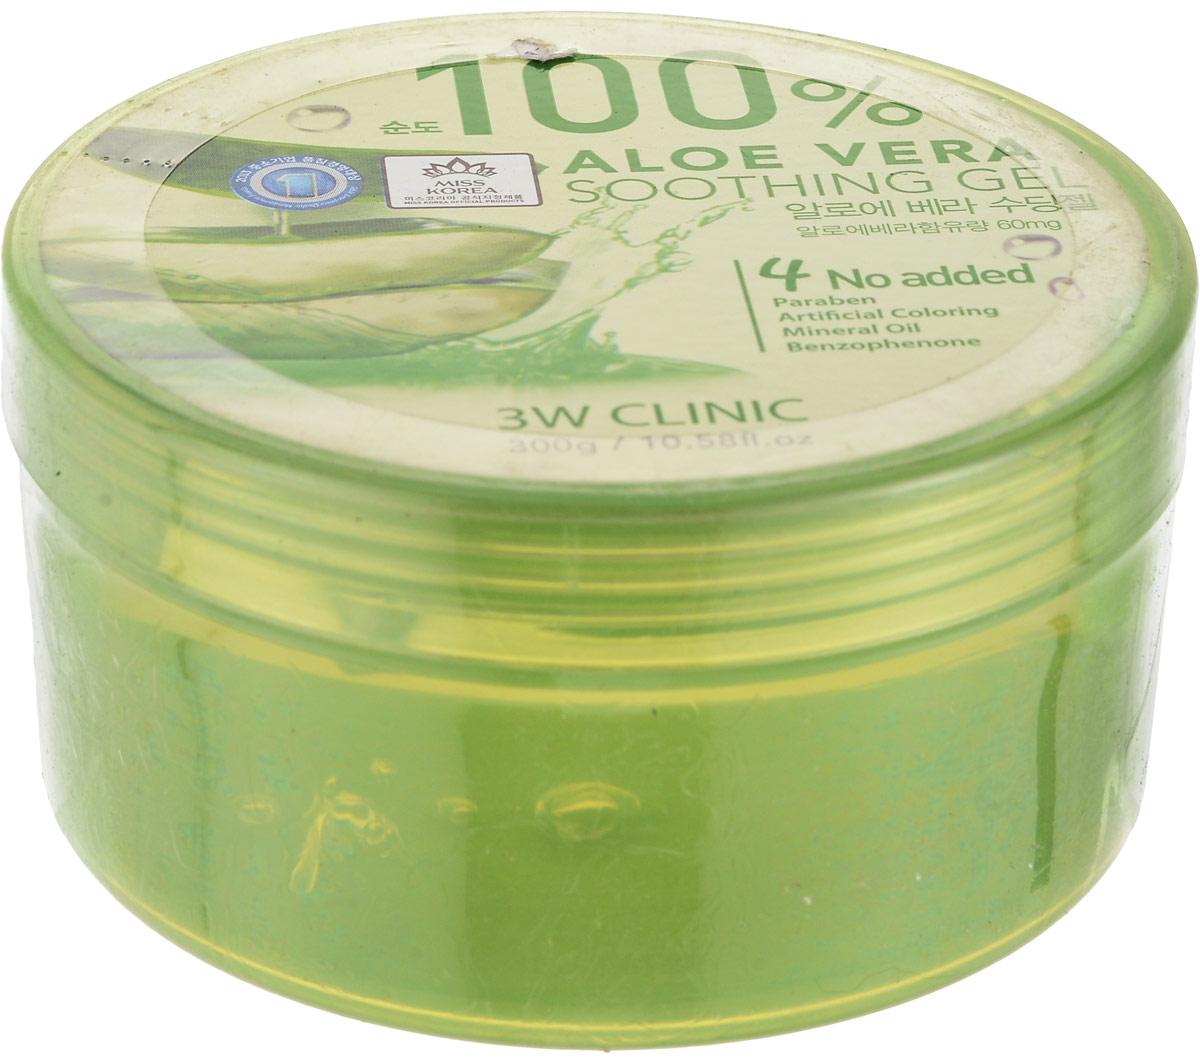 3W Clinic Гель универсальный Aloe Vera Soothing Gel 100%, 300 гр гель sea of spa aloe vera gel 180 мл